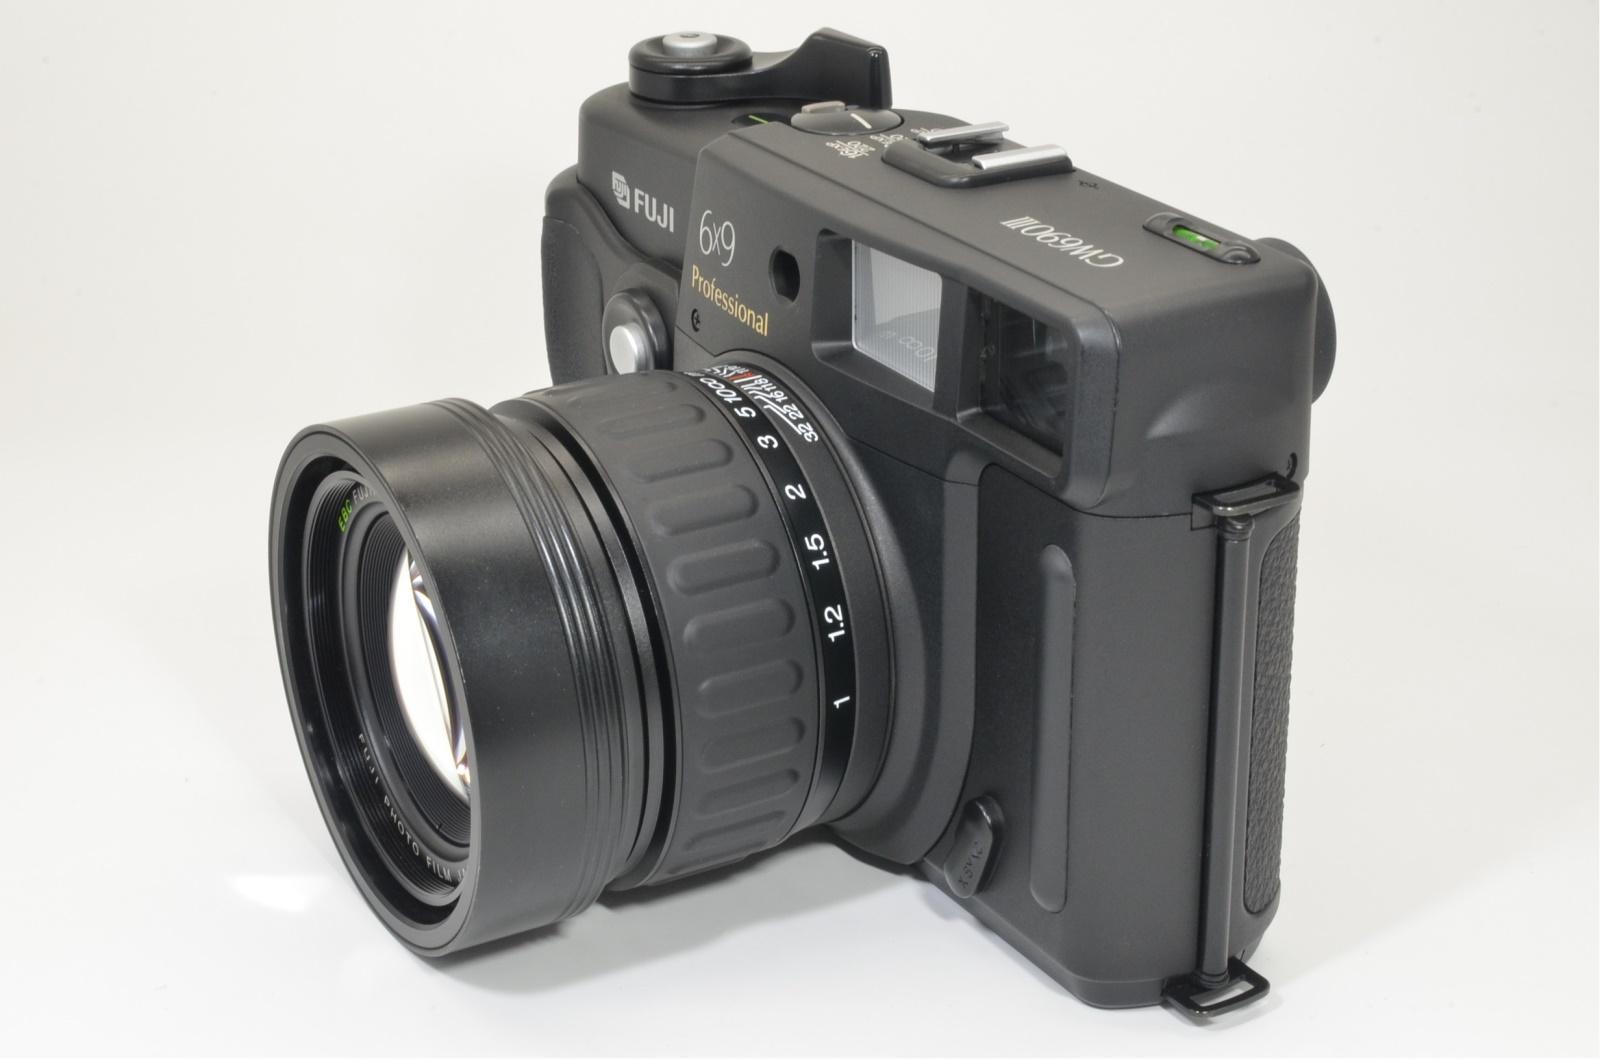 fuji fujifilm gw690iii 90mm f3.5 count 079 medium format camera shooting tested